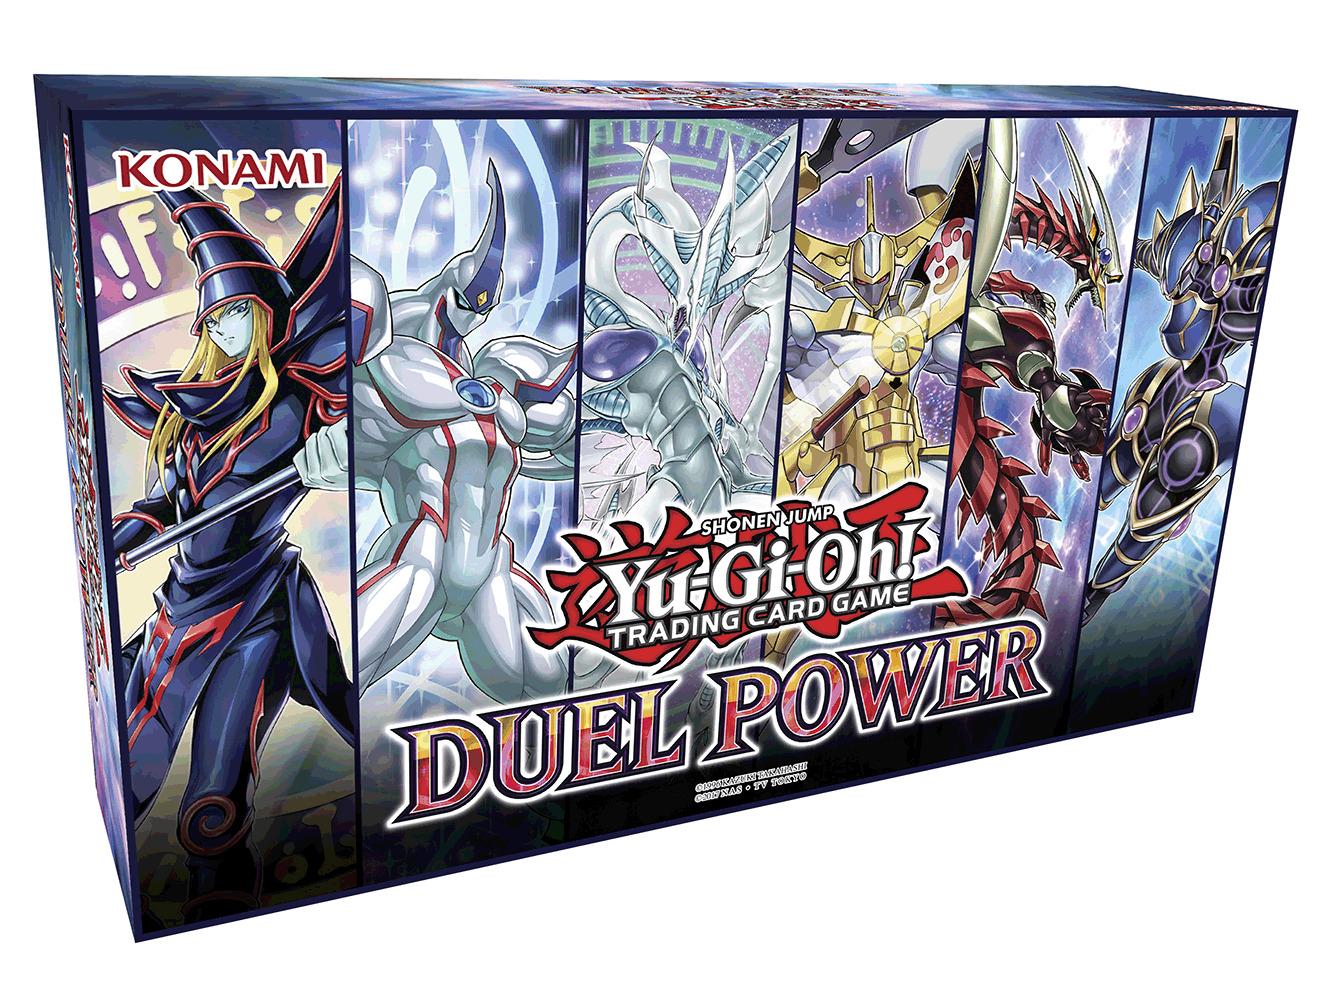 Yu-Gi-Oh! TCG Duel Power image